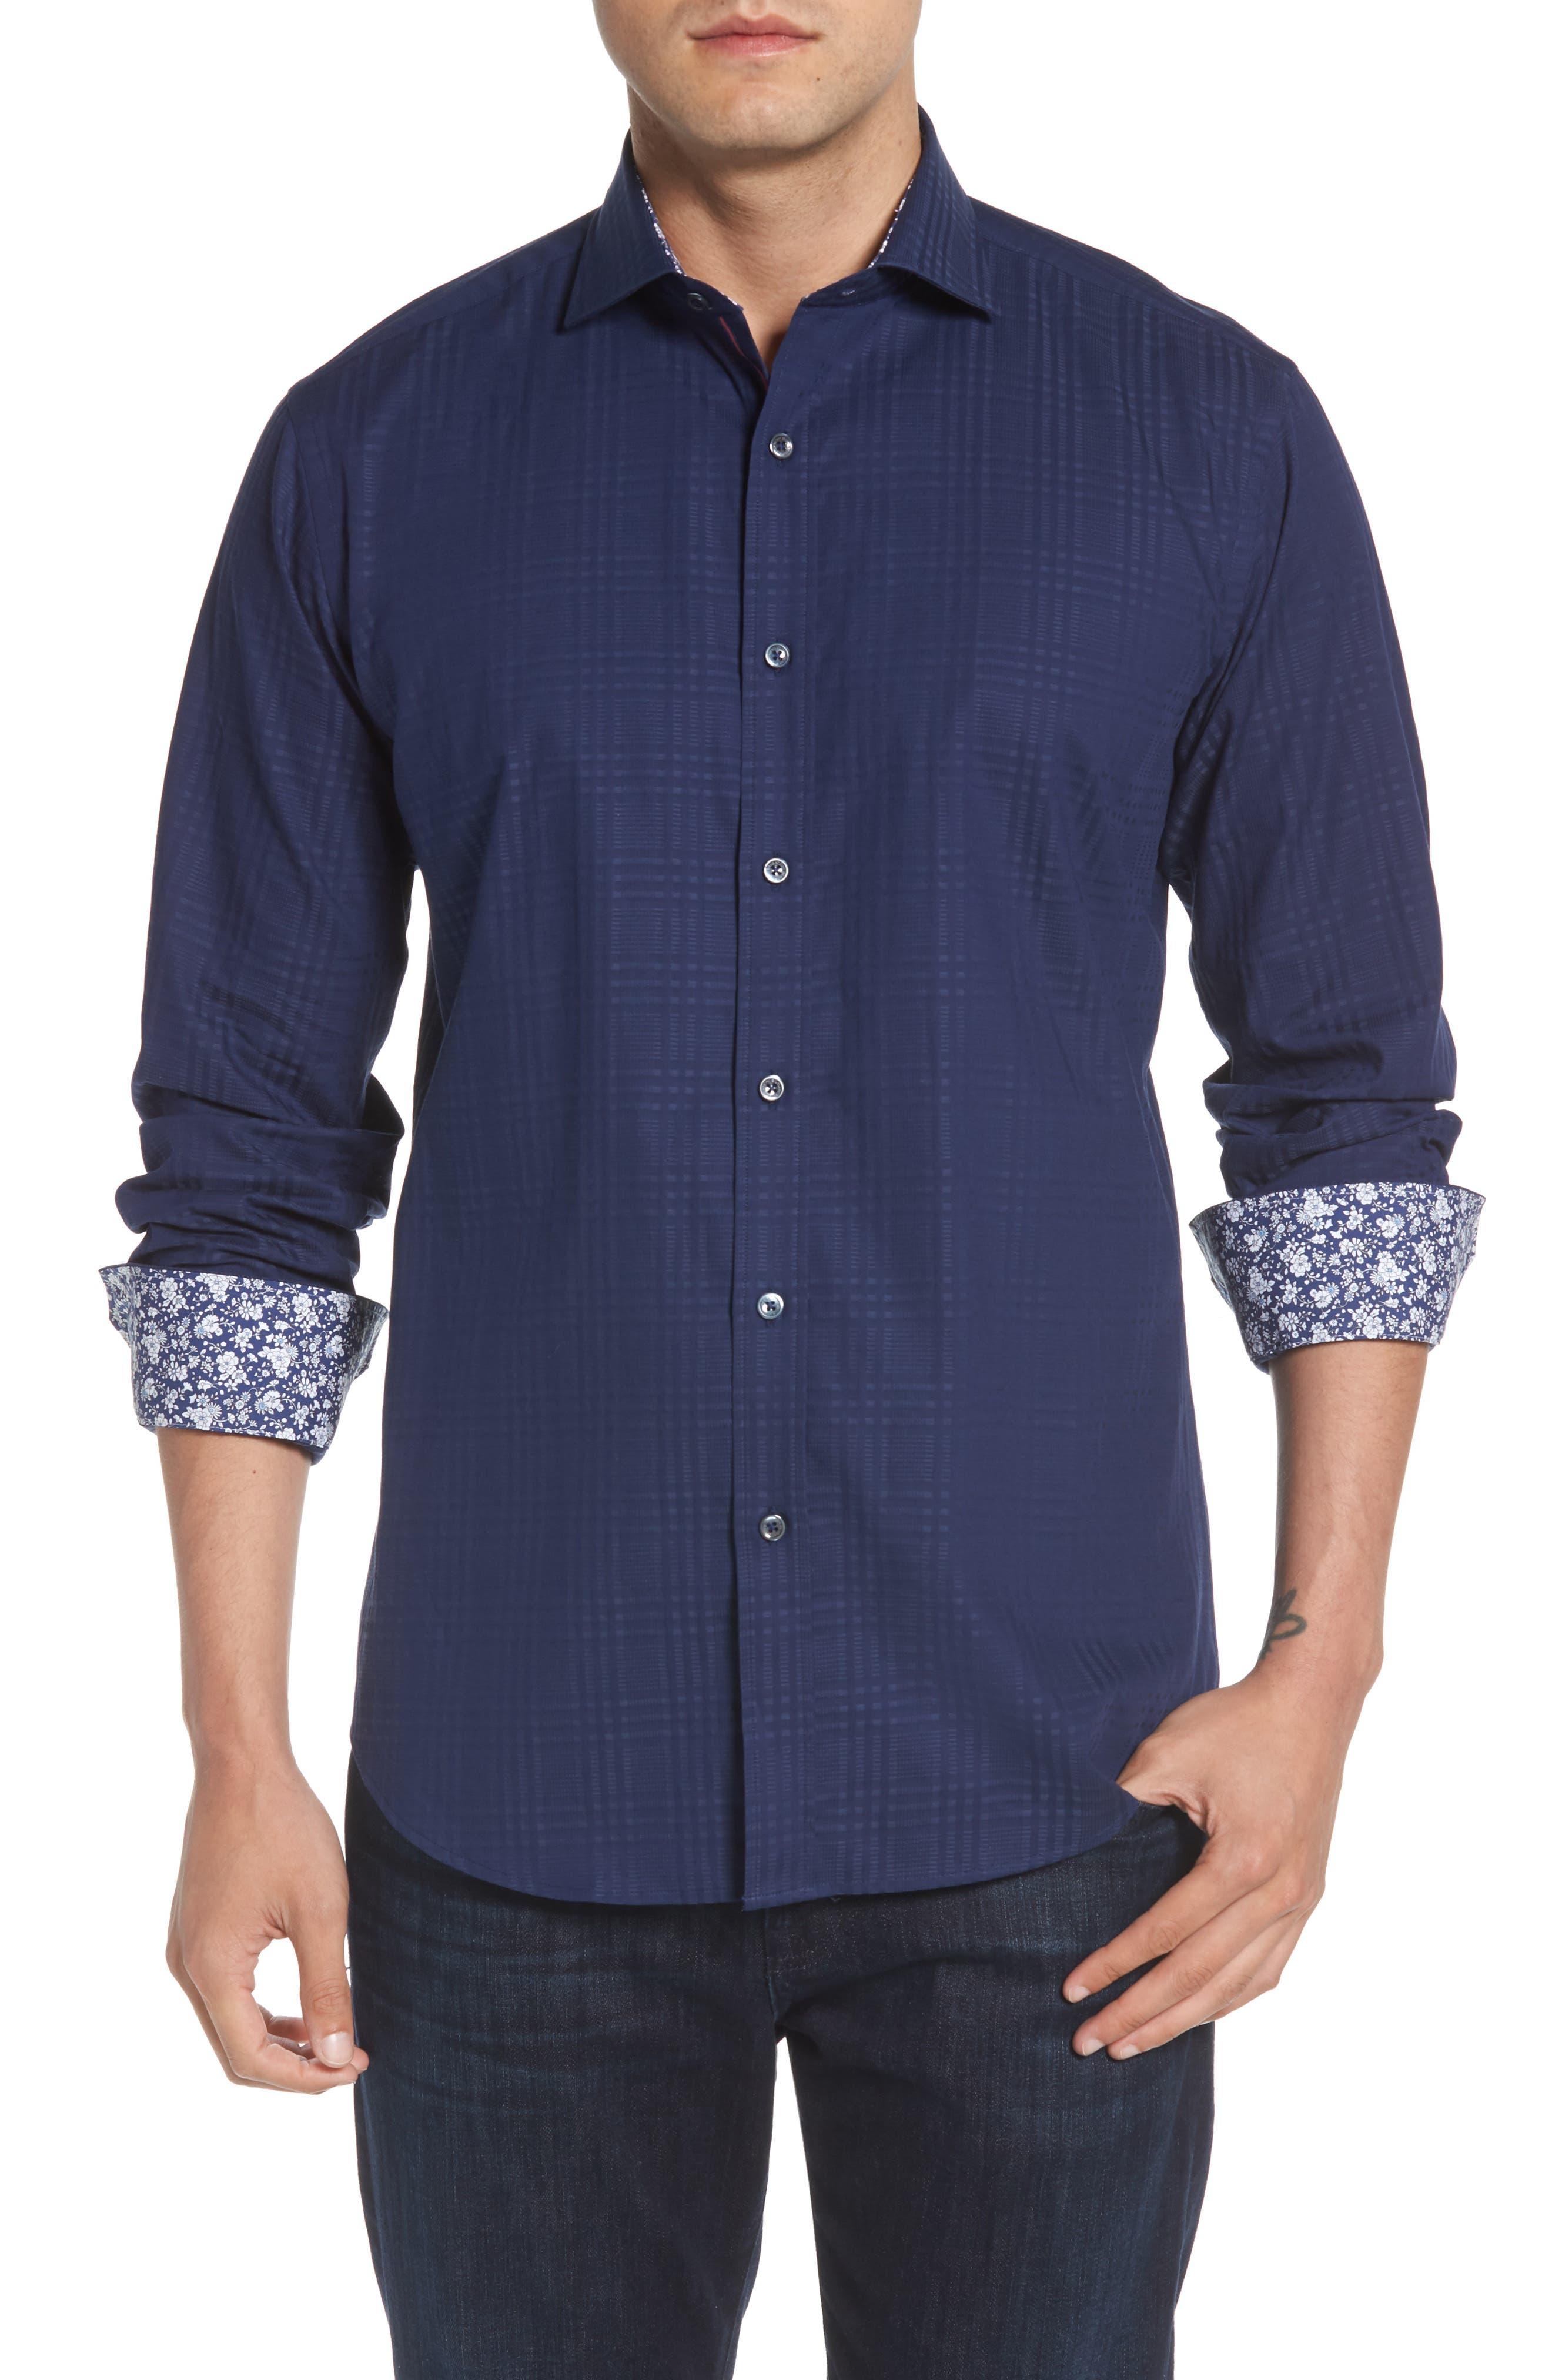 Alternate Image 1 Selected - Bugatchi Shaped Fit Tonal Plaid Sport Shirt